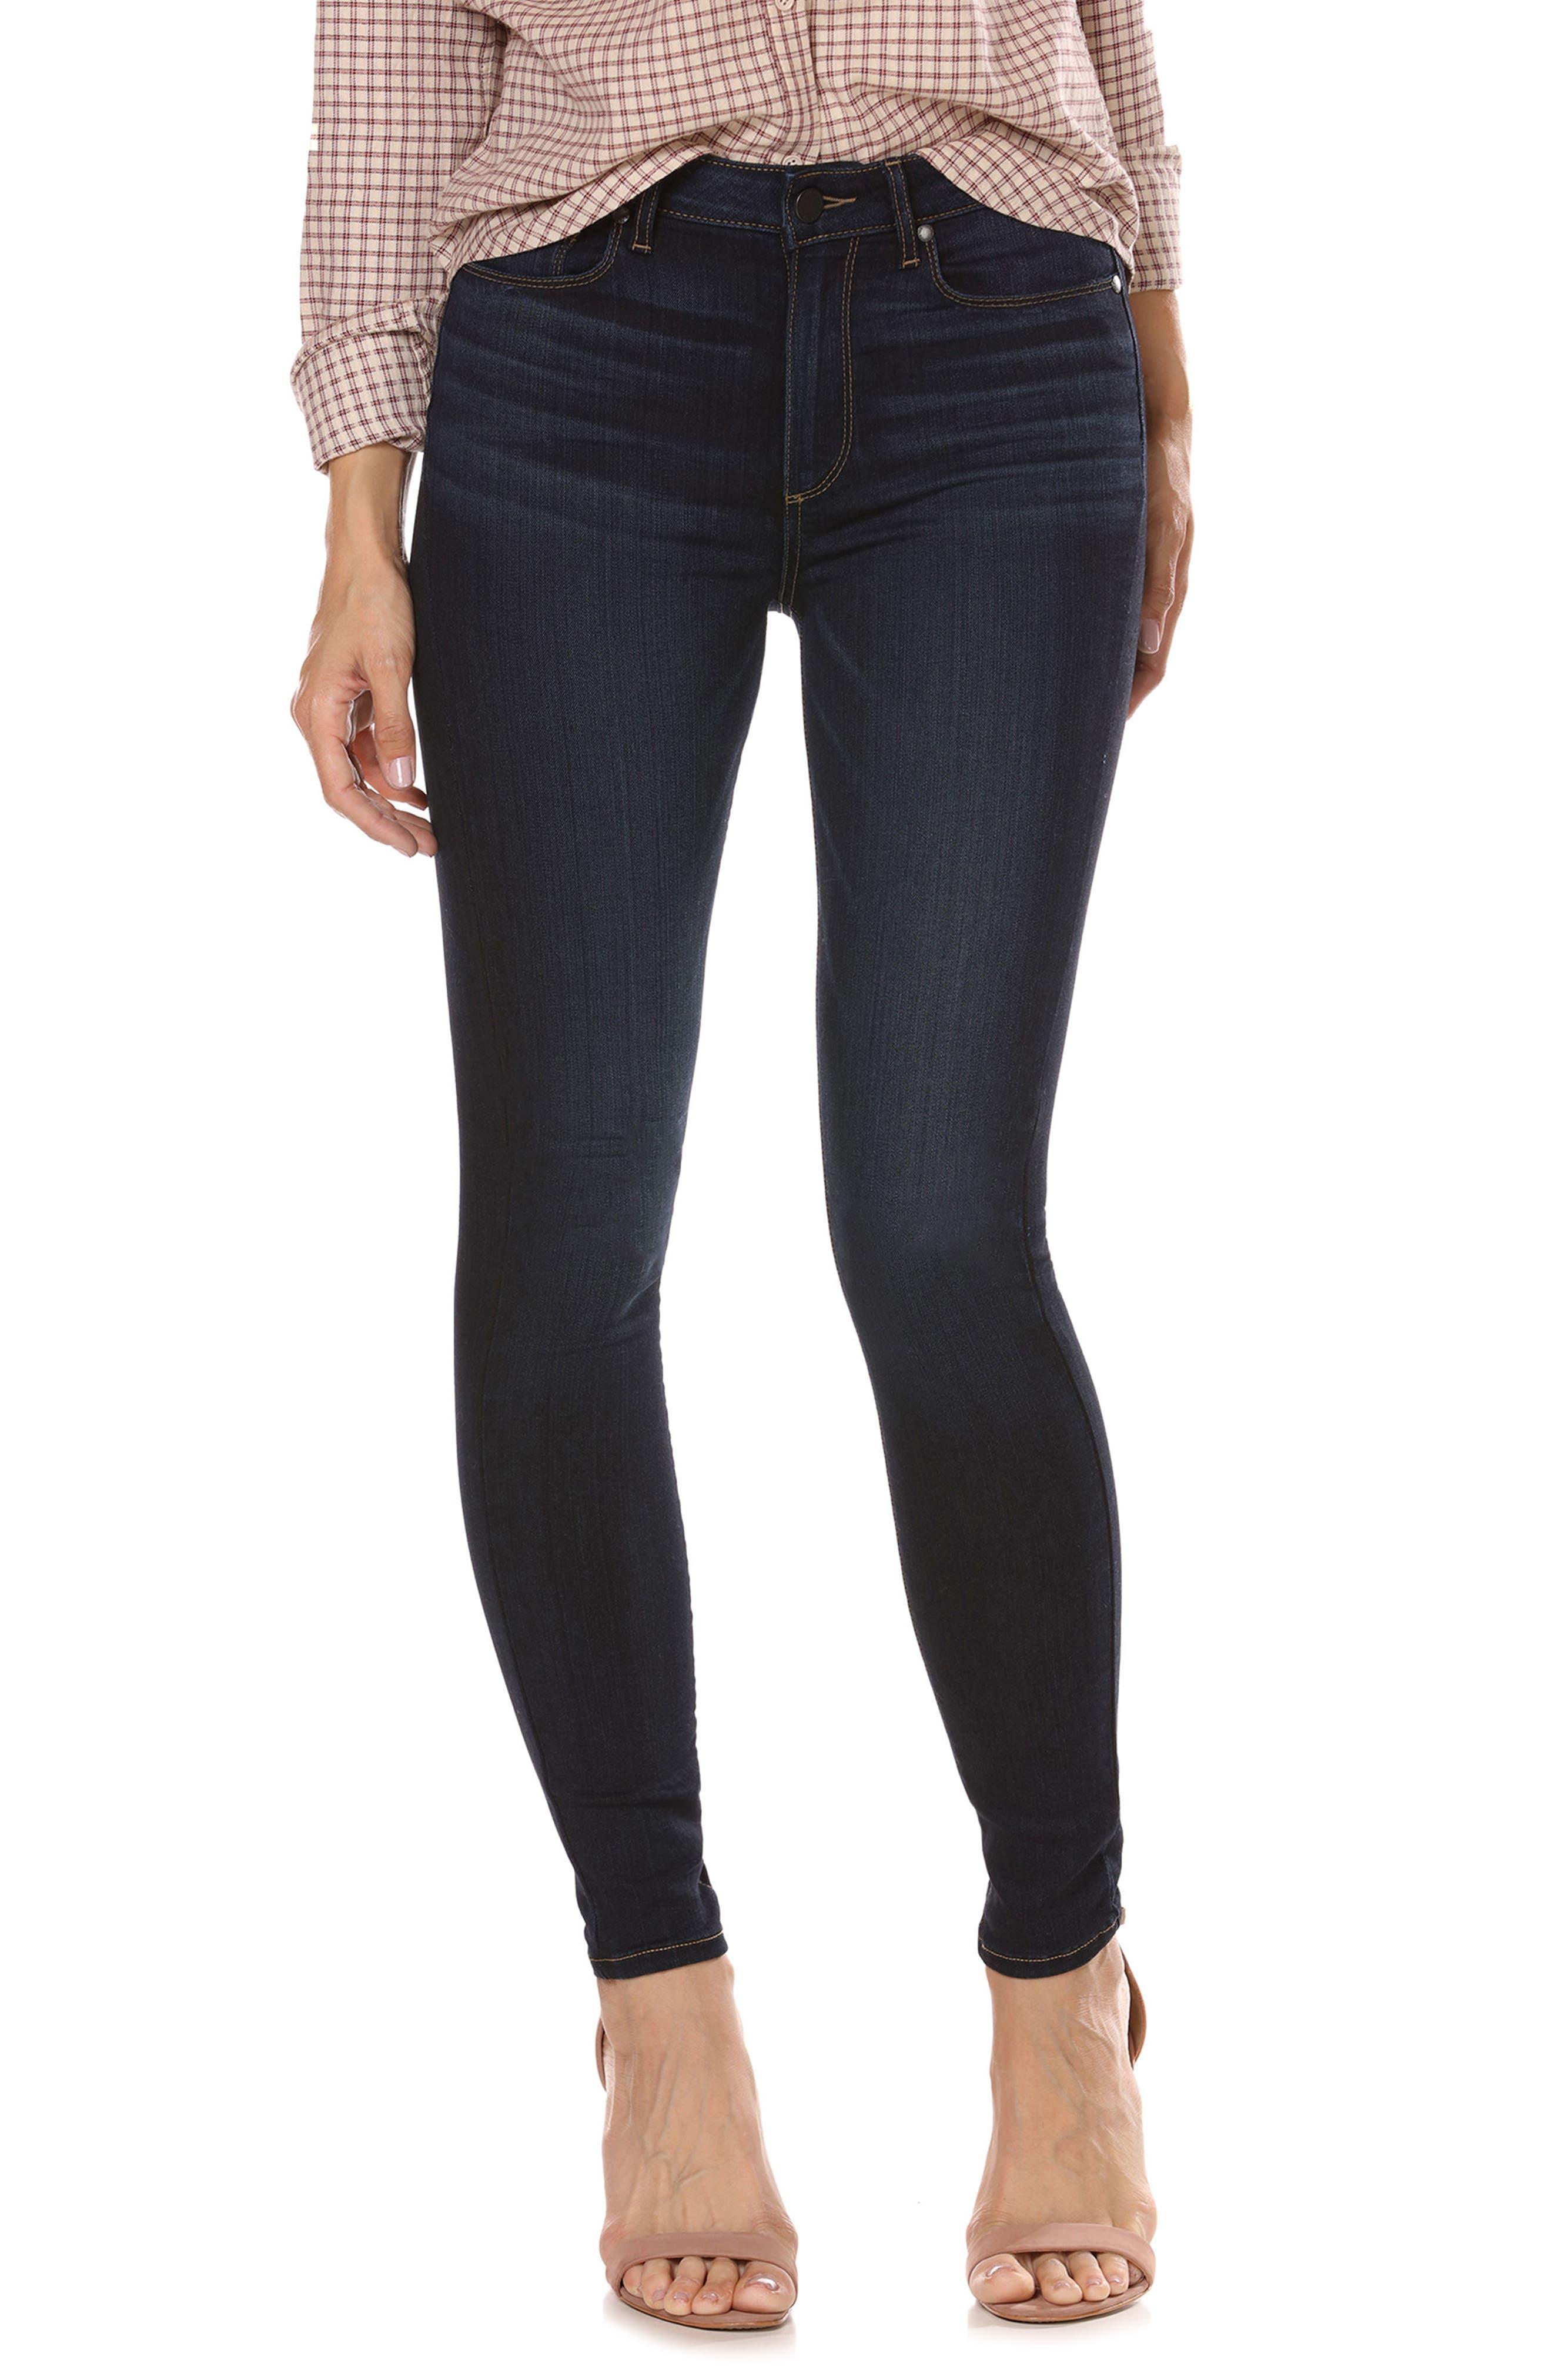 Main Image - PAIGE Transcend - Hoxton High Waist Ankle Skinny Jeans (Koda)